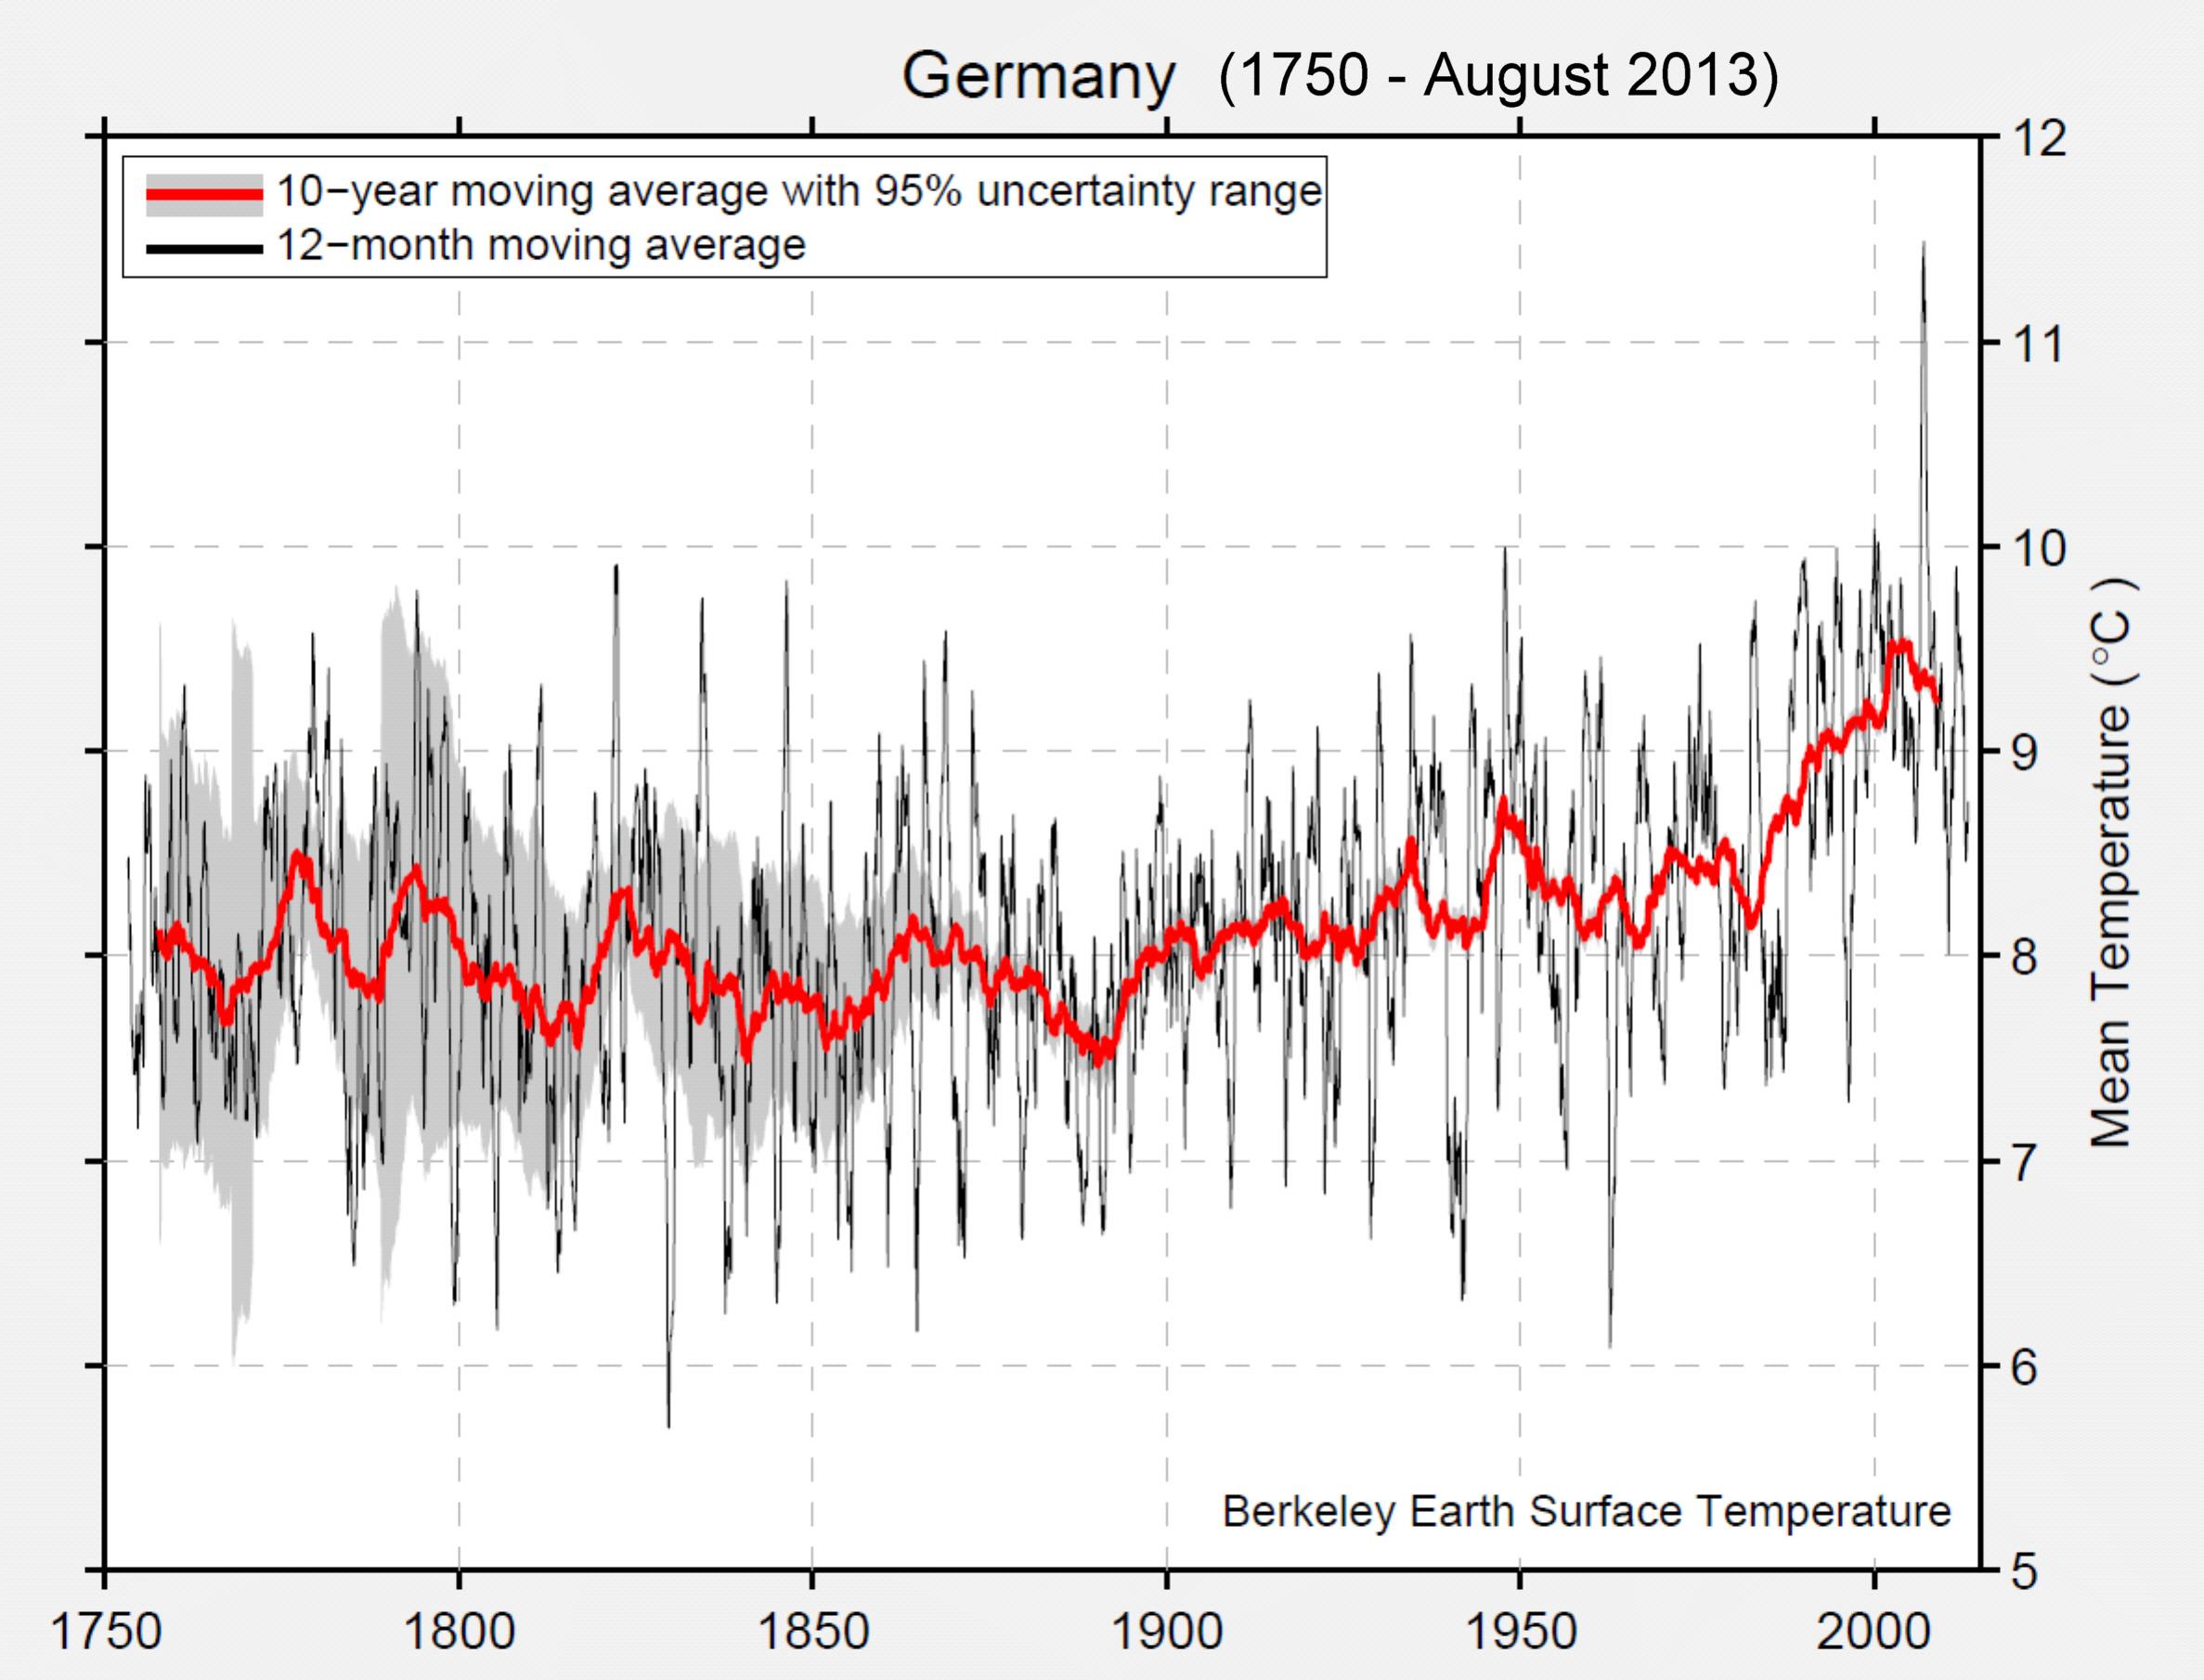 https://upload.wikimedia.org/wikipedia/commons/9/9c/Deutschland_Temp_%281750-2013%29.jpg